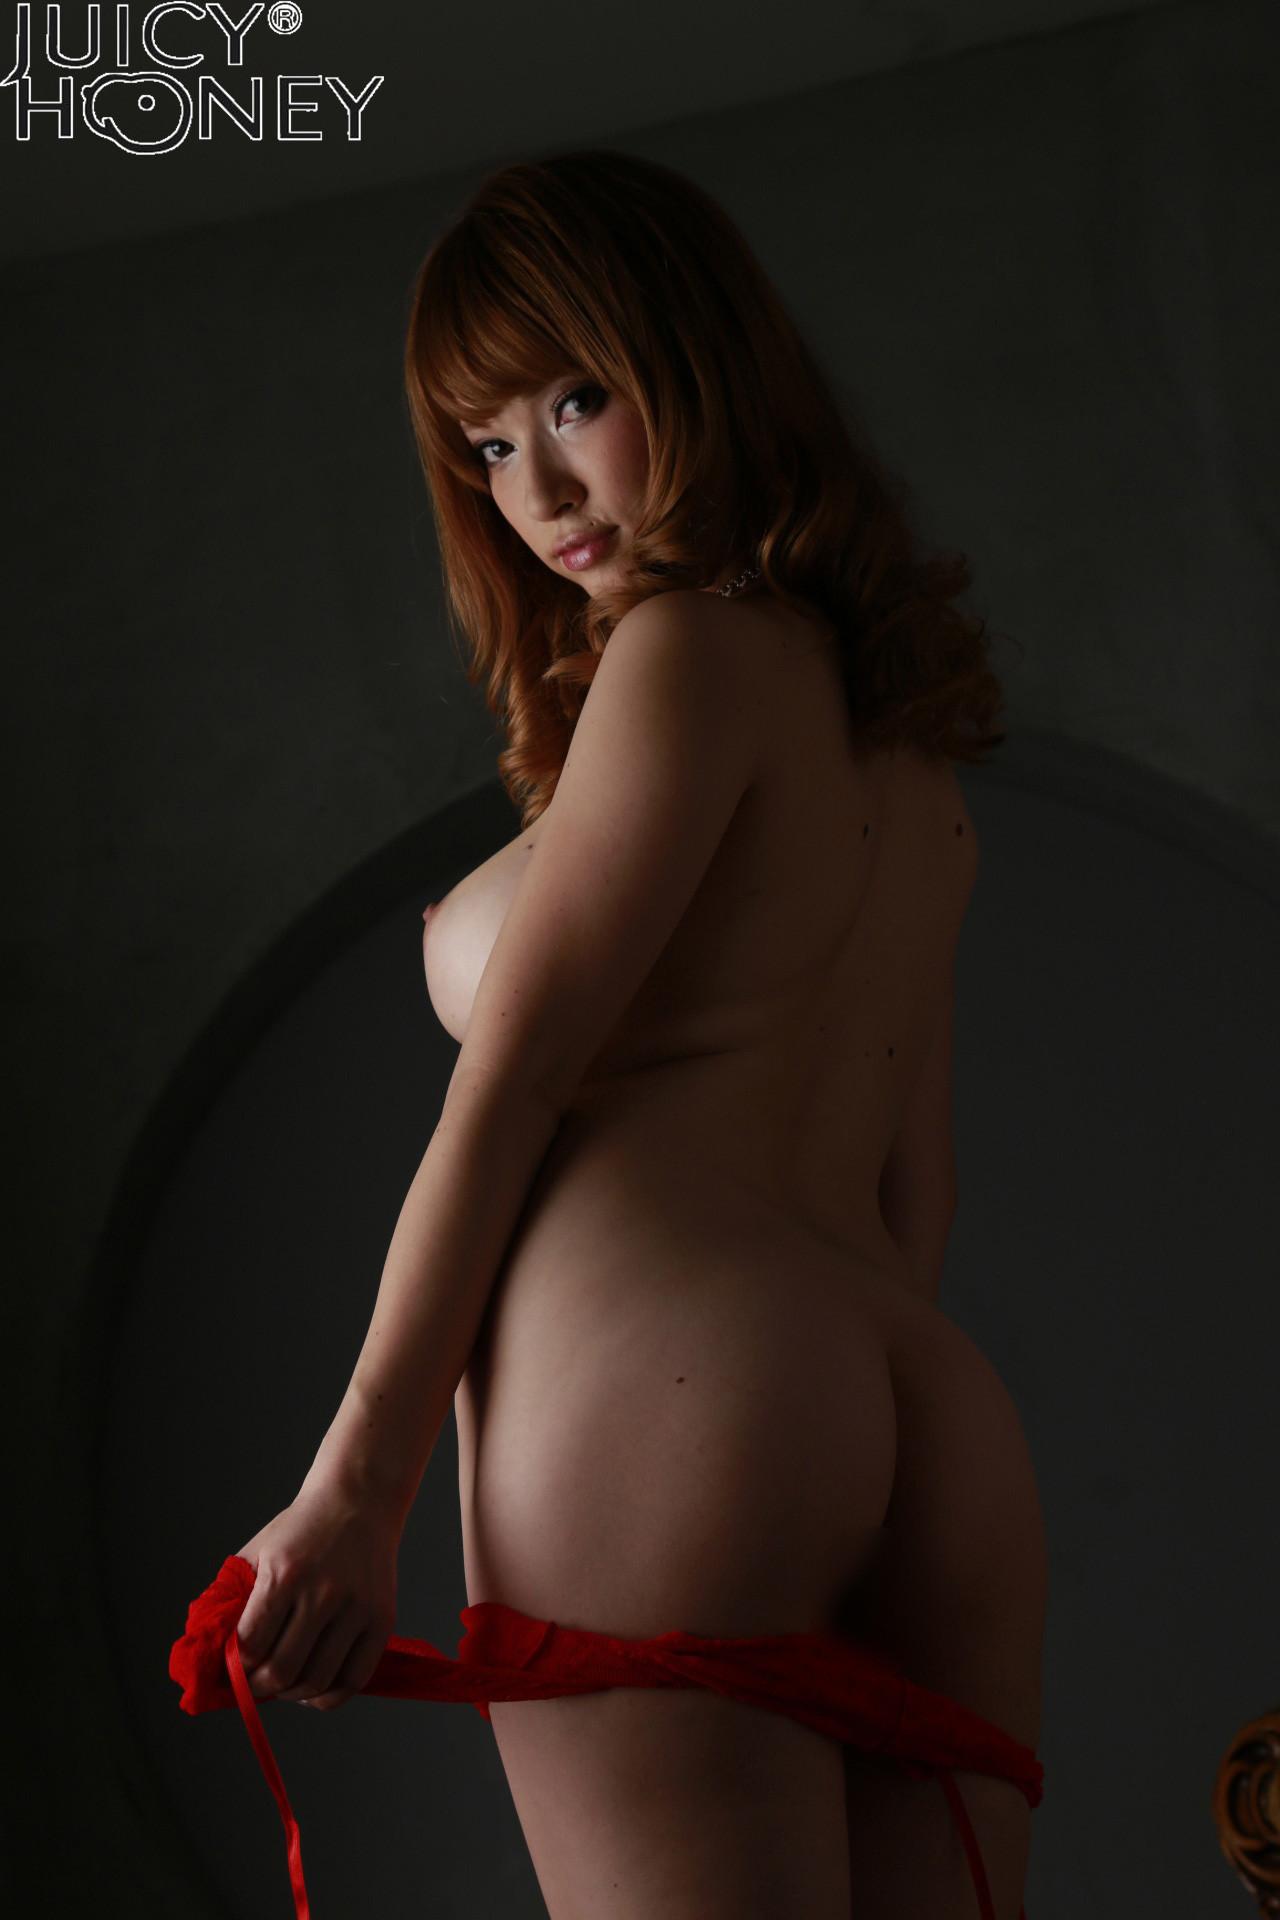 [X-City] Juicy Honey No.123 ティア l-023